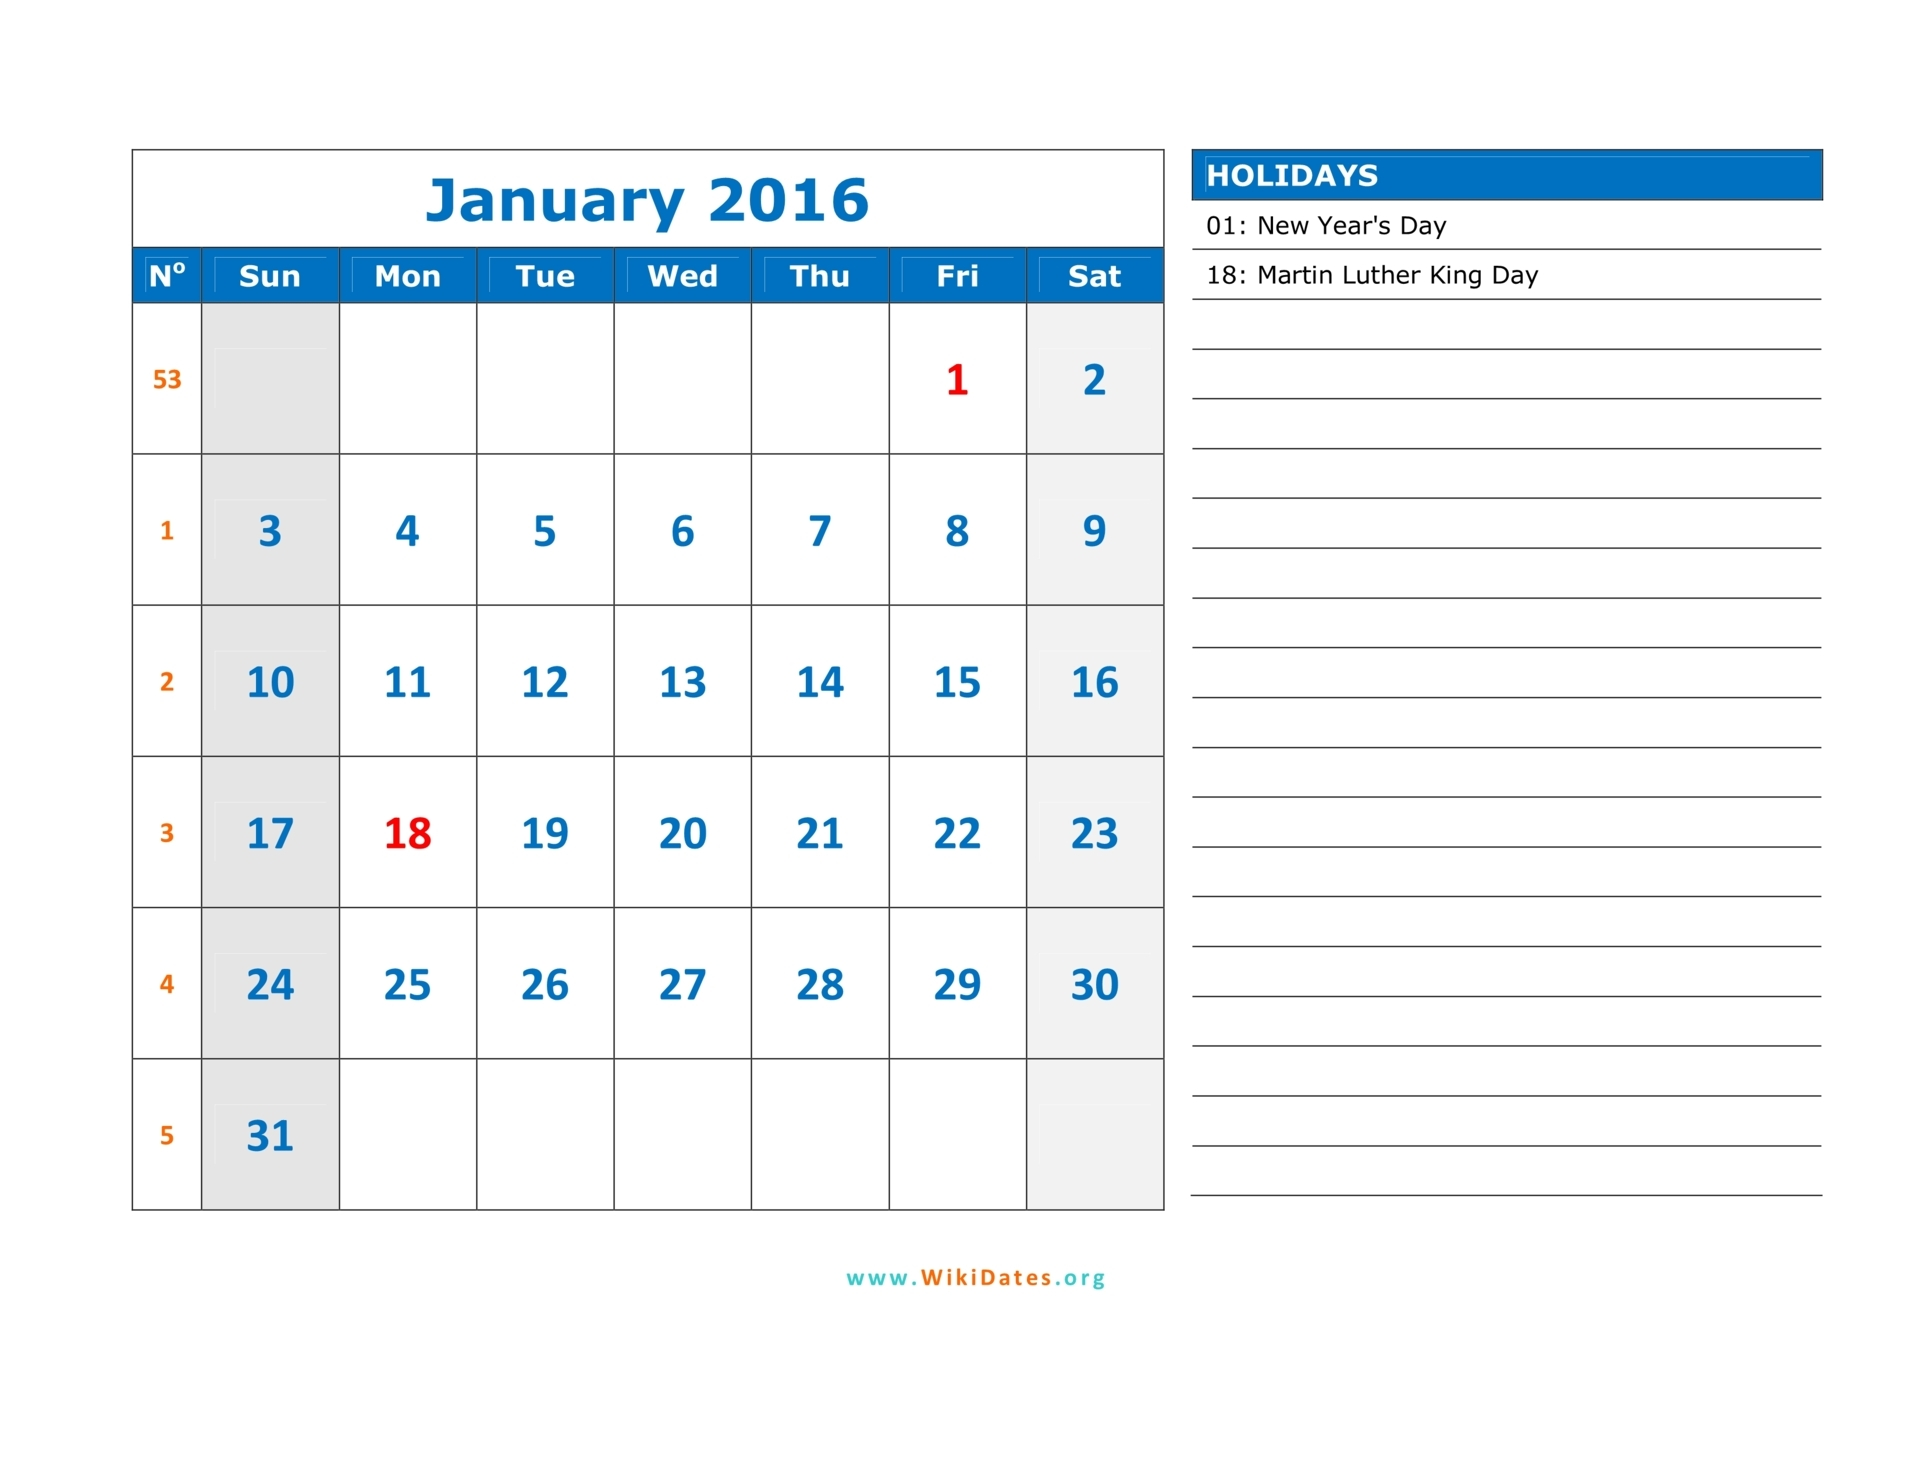 January 2016 Calendar | WikiDates.org